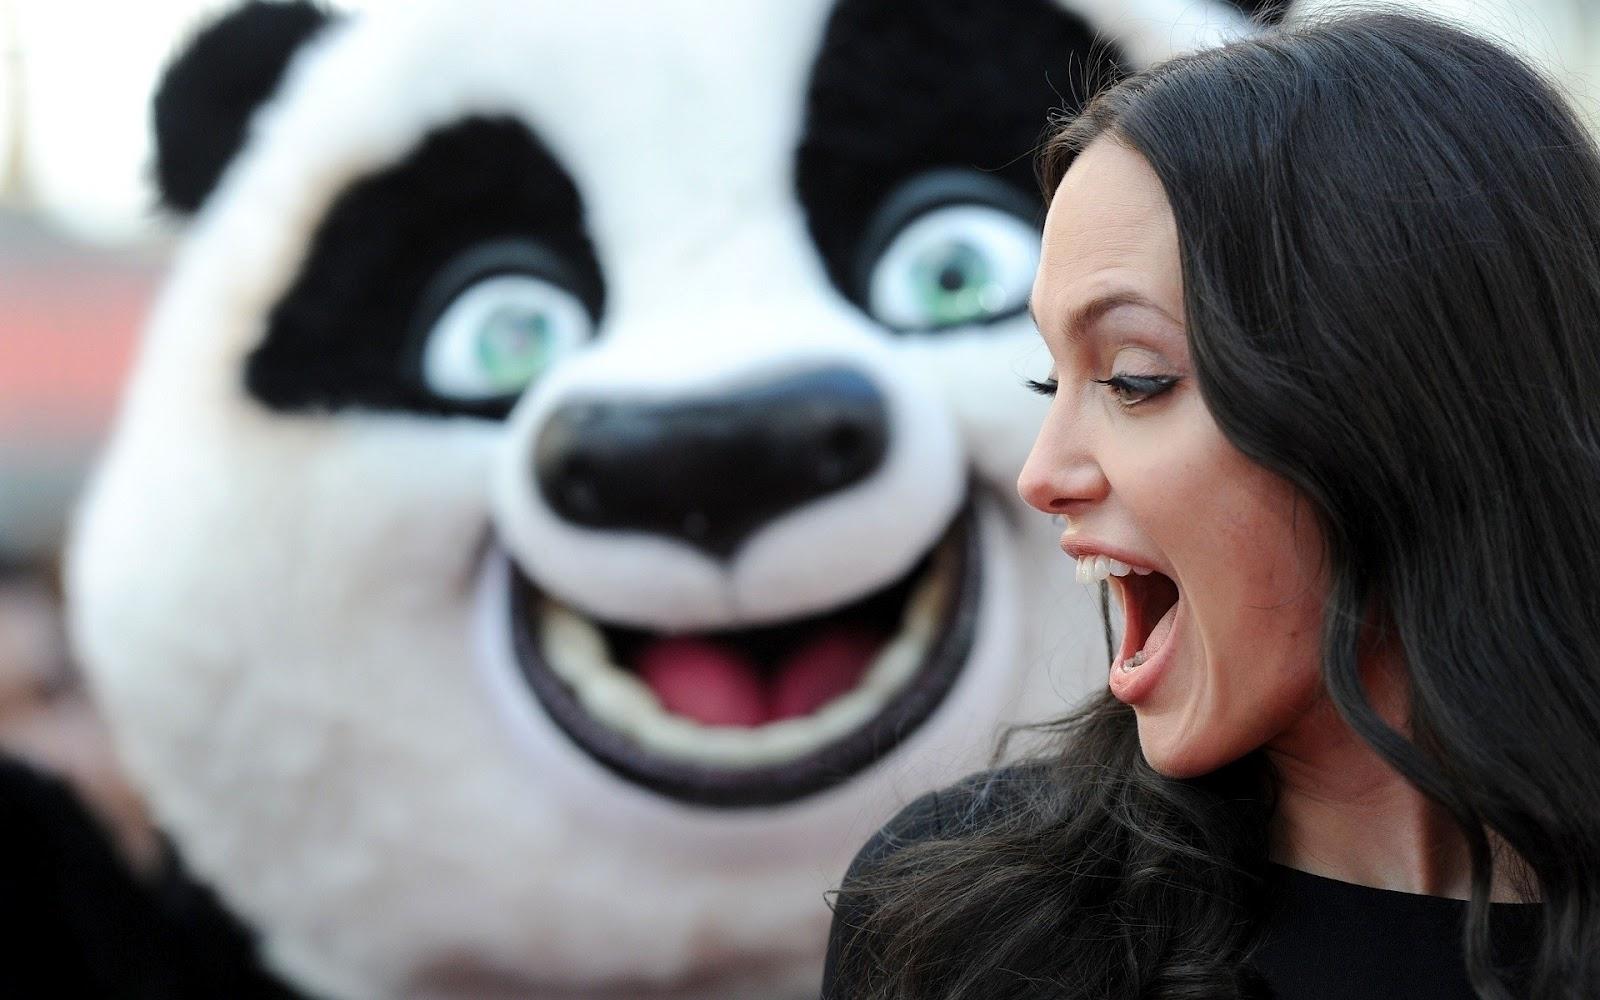 http://2.bp.blogspot.com/-SUAQ7KPeisU/T6Vjf6qgCJI/AAAAAAAABmA/XRNK7M0zo-Q/s1600/Angelina_Jolie_and_Smiling_Panda_HD_Wallpaper-Vvallpaper.Net.jpg